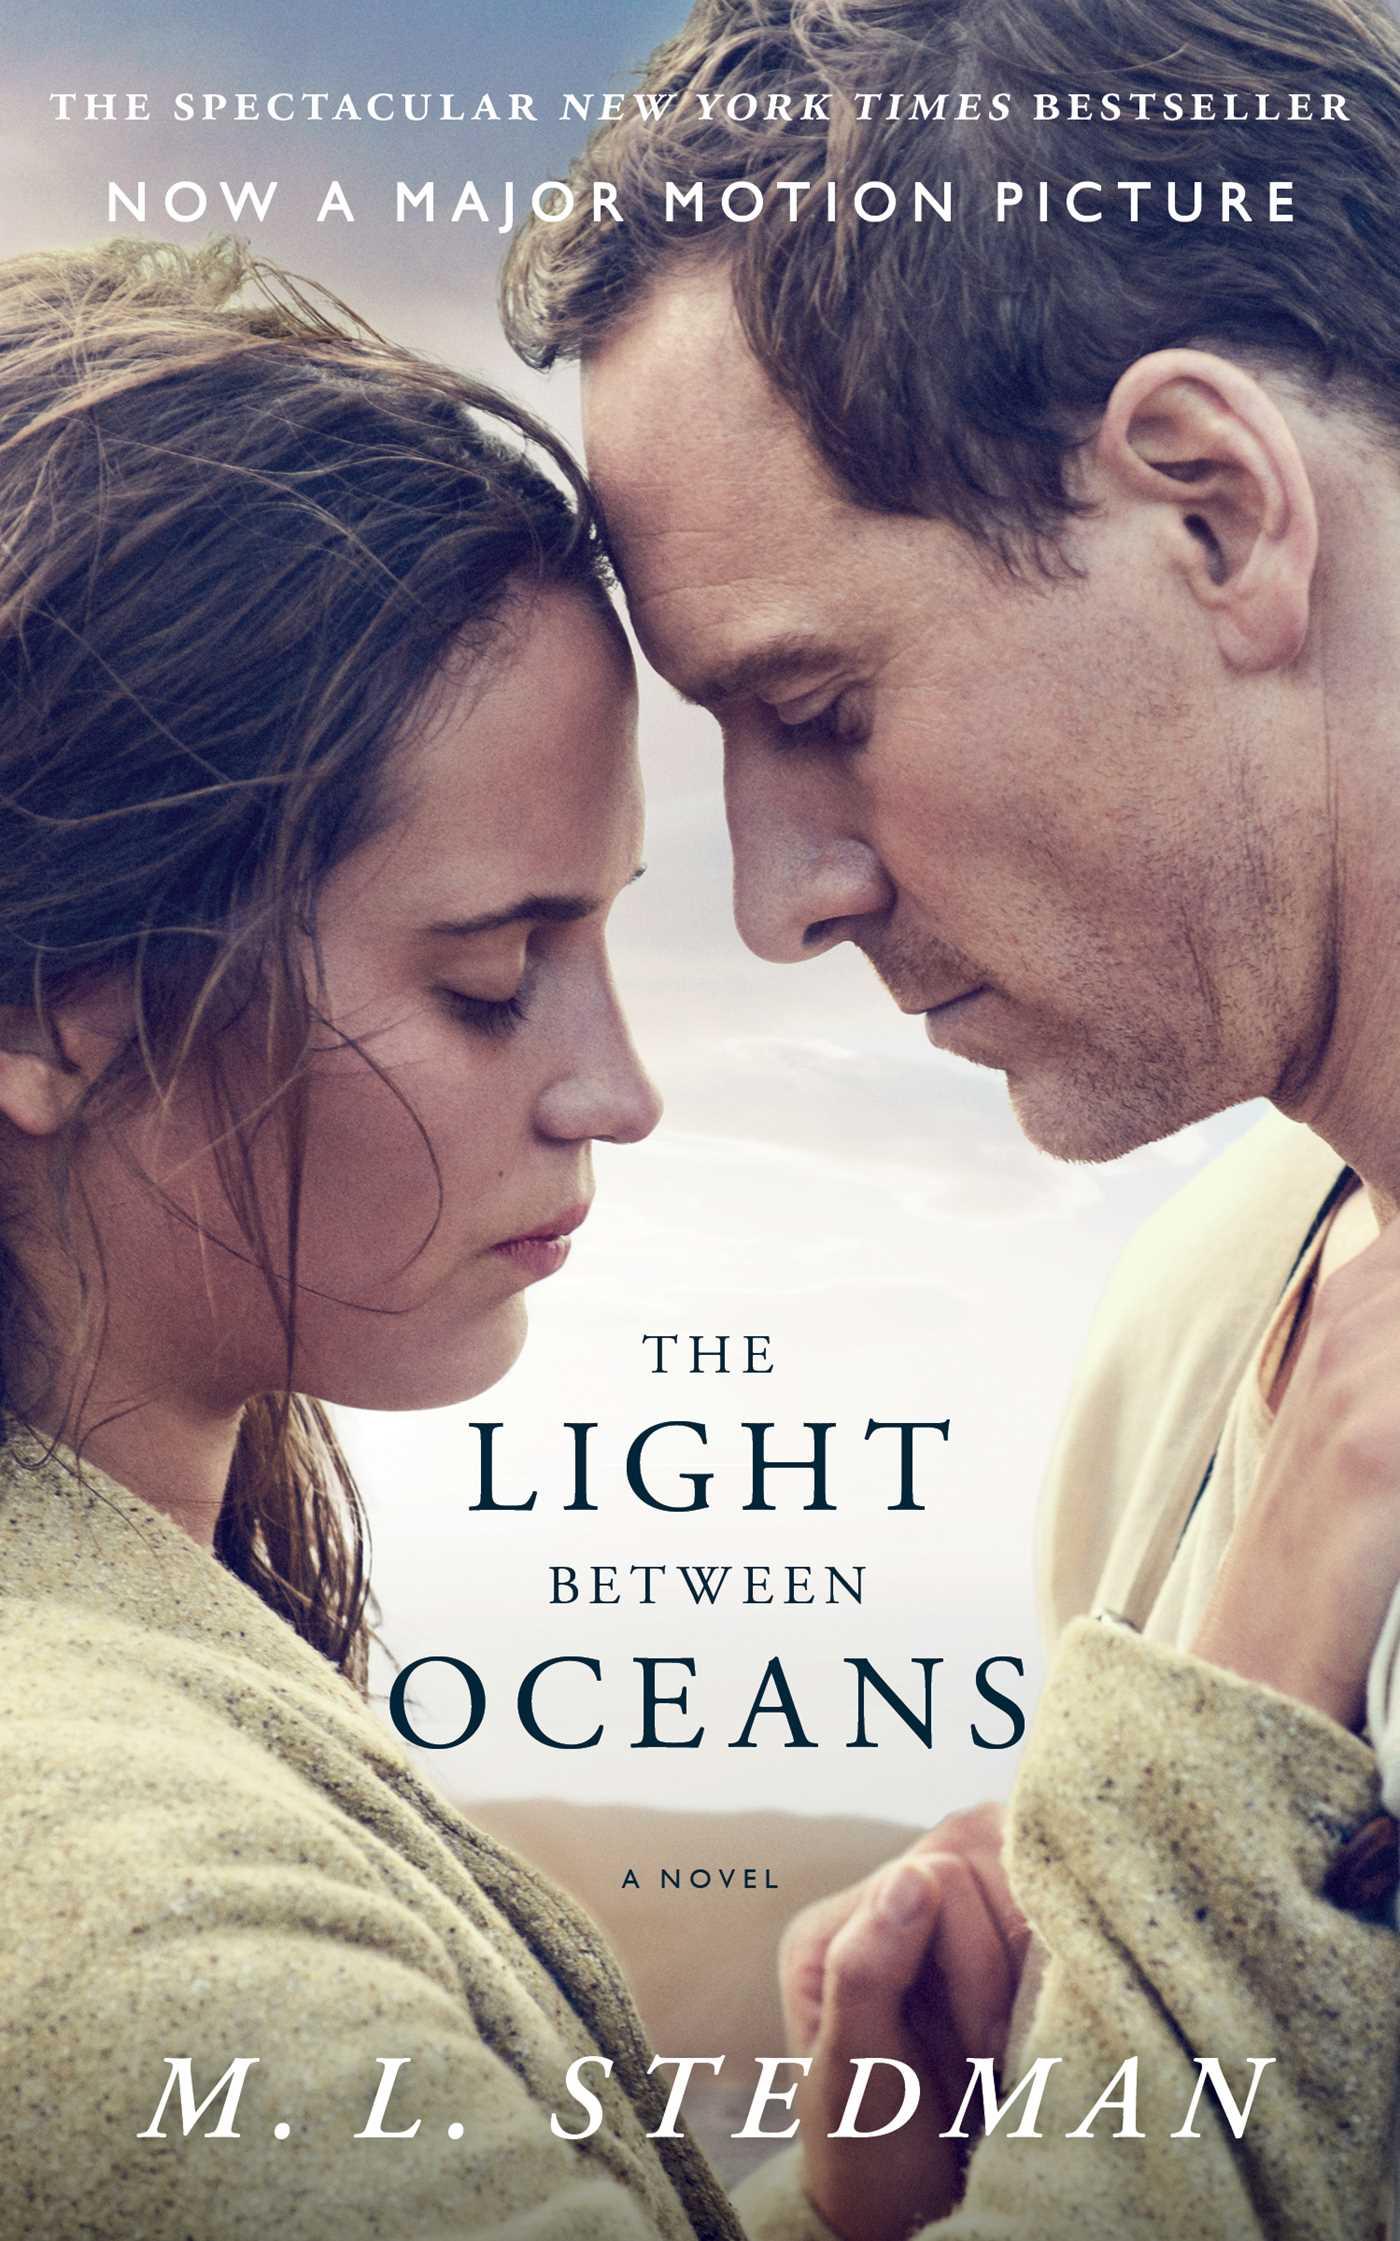 The Light Between Oceans [electronic resource] : A Novel